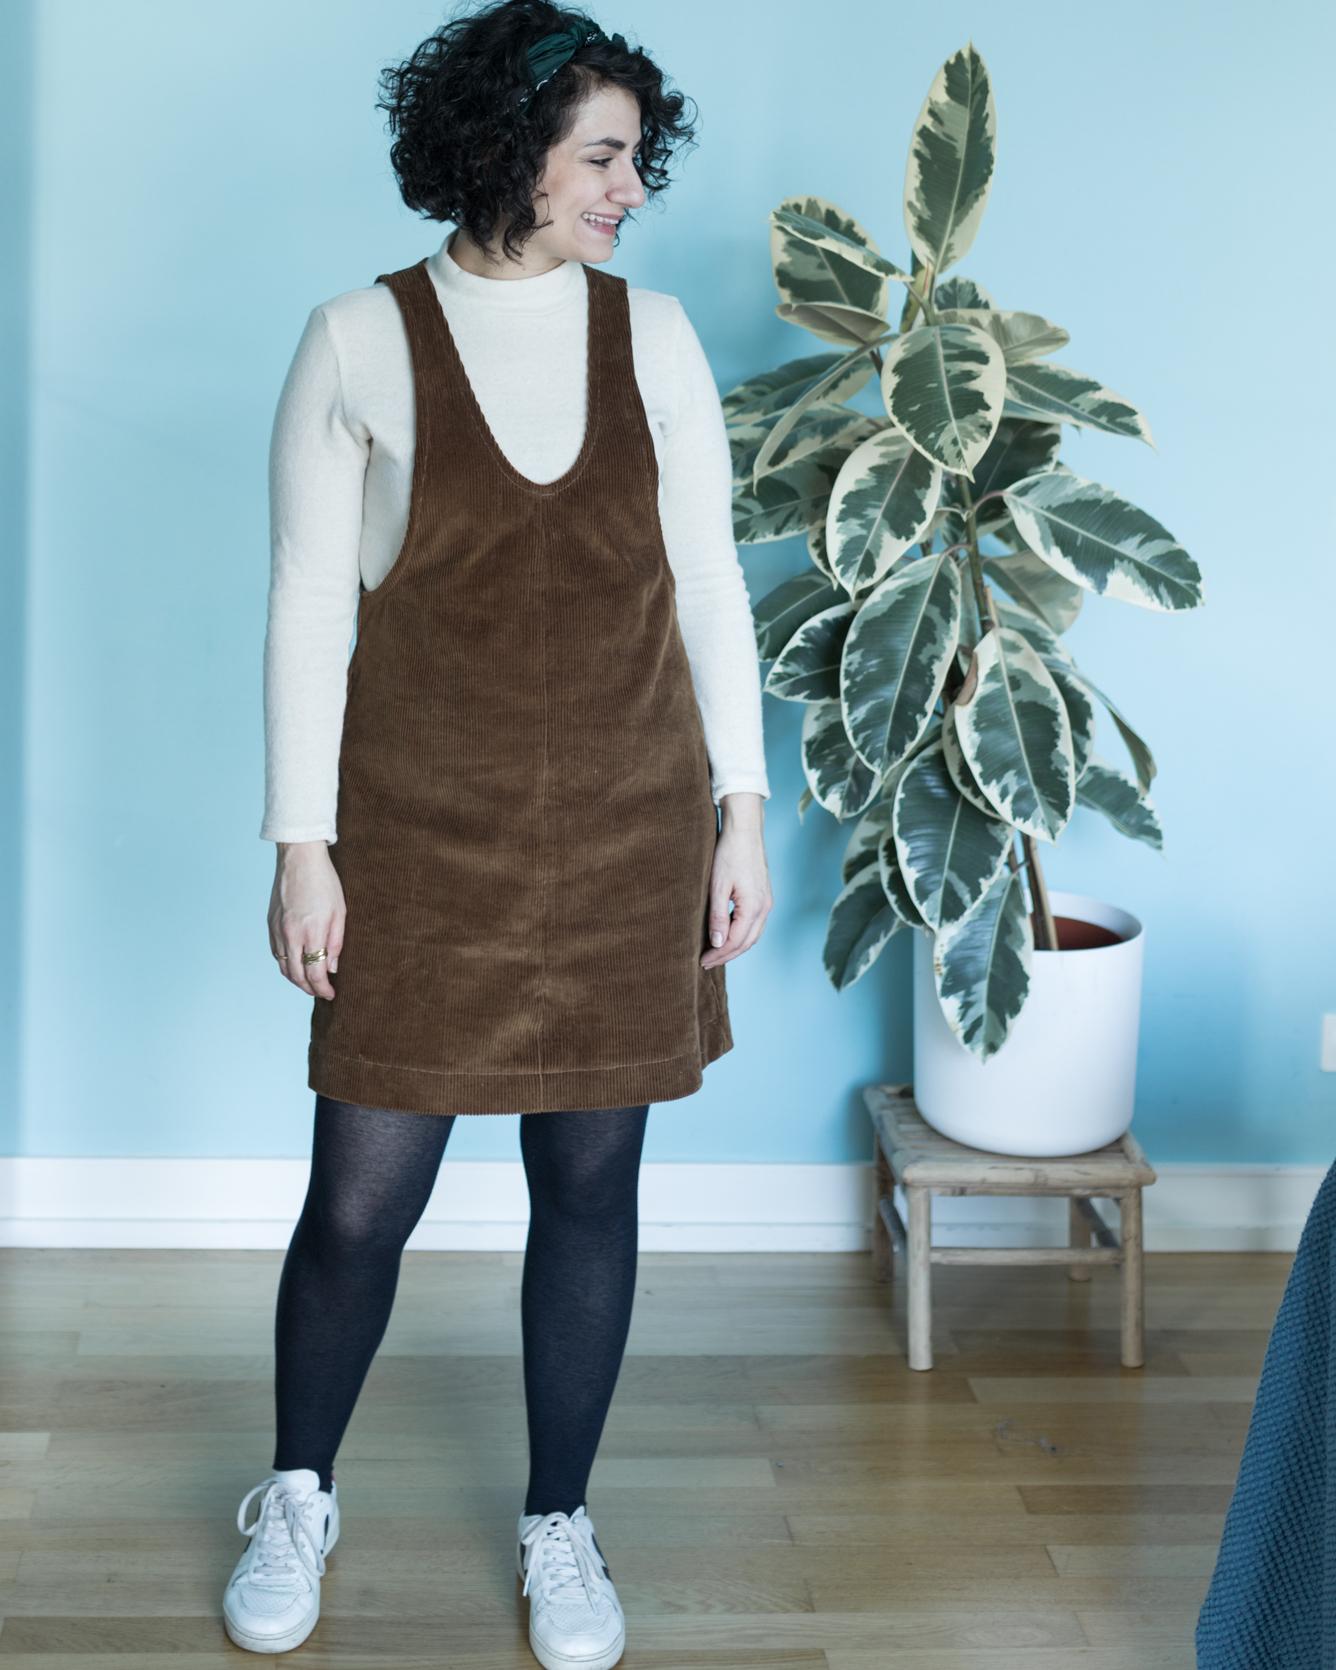 York Pinafore - Selbstgenähtes Latzkleid aus Cord - Tweed & Greet